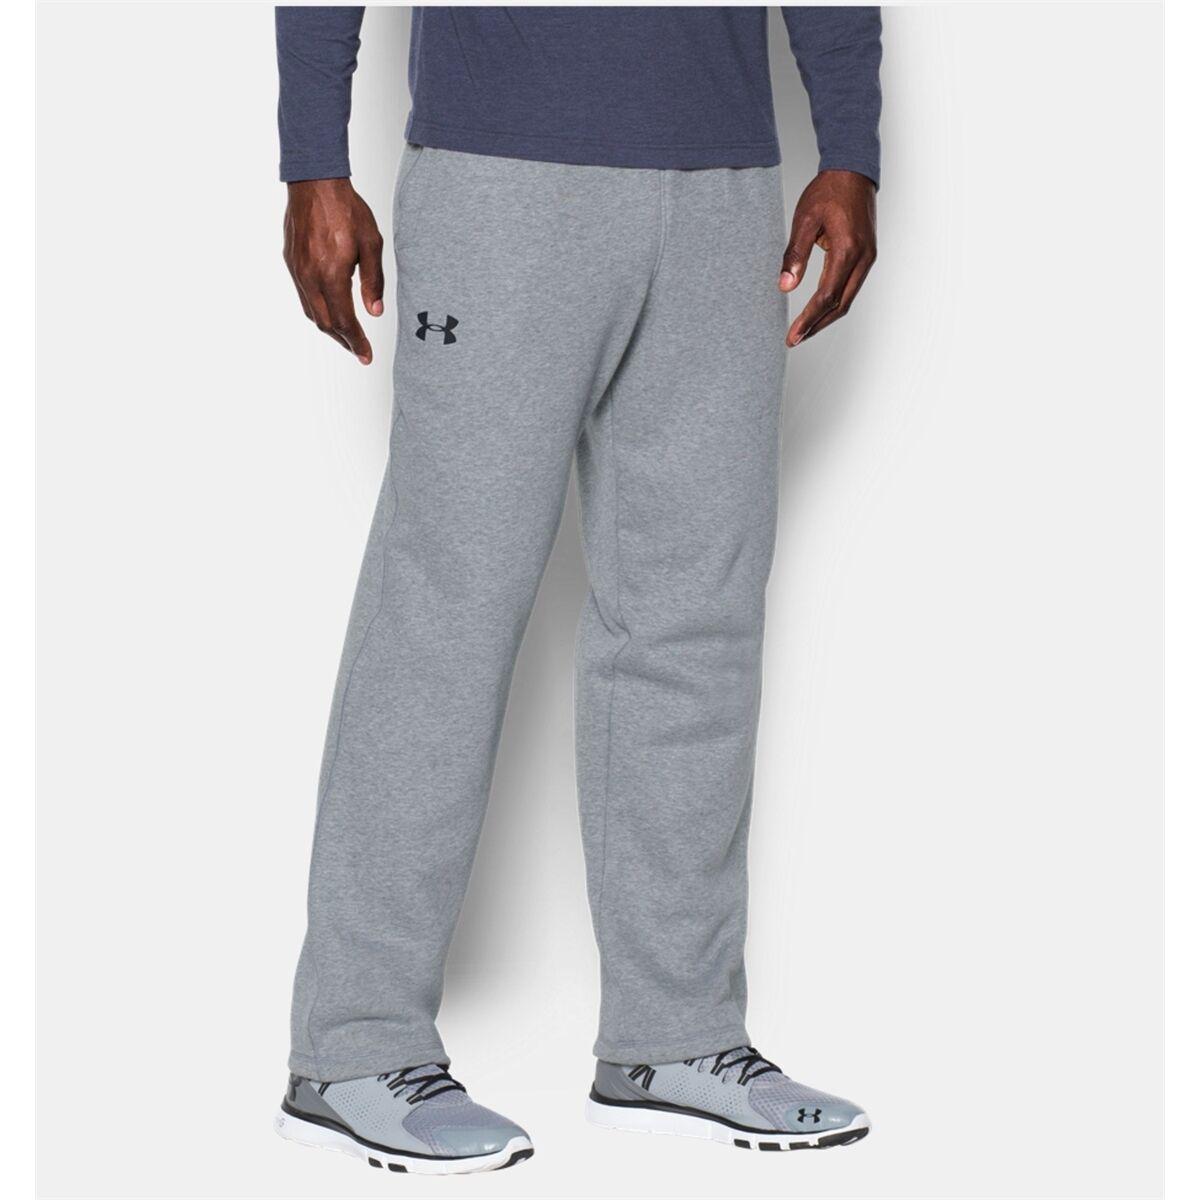 Herren Under Armour Pants grau Storm Rival Fleece Pants Loose Fit 1280779 New